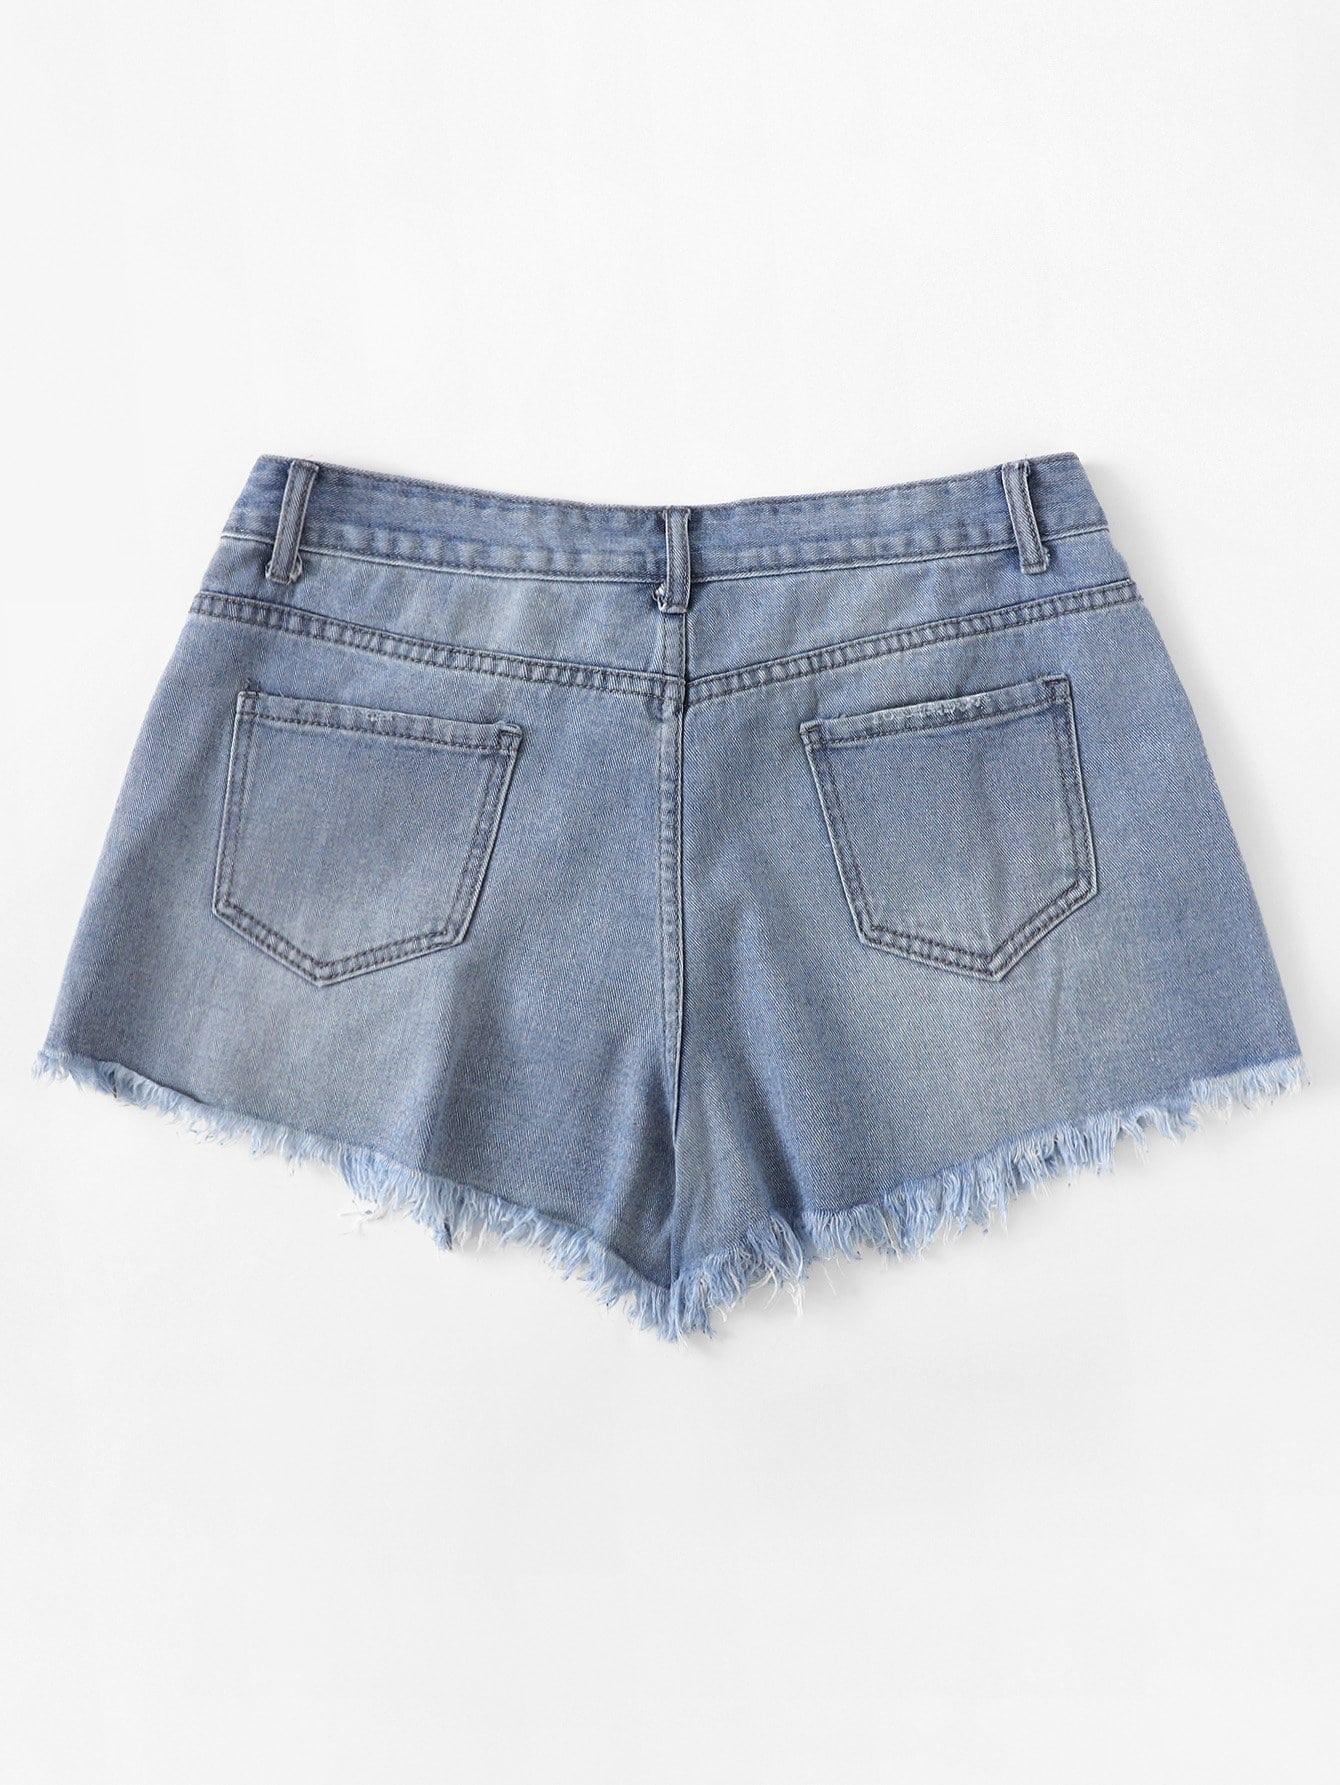 zerrissene jeans shorts german shein sheinside. Black Bedroom Furniture Sets. Home Design Ideas